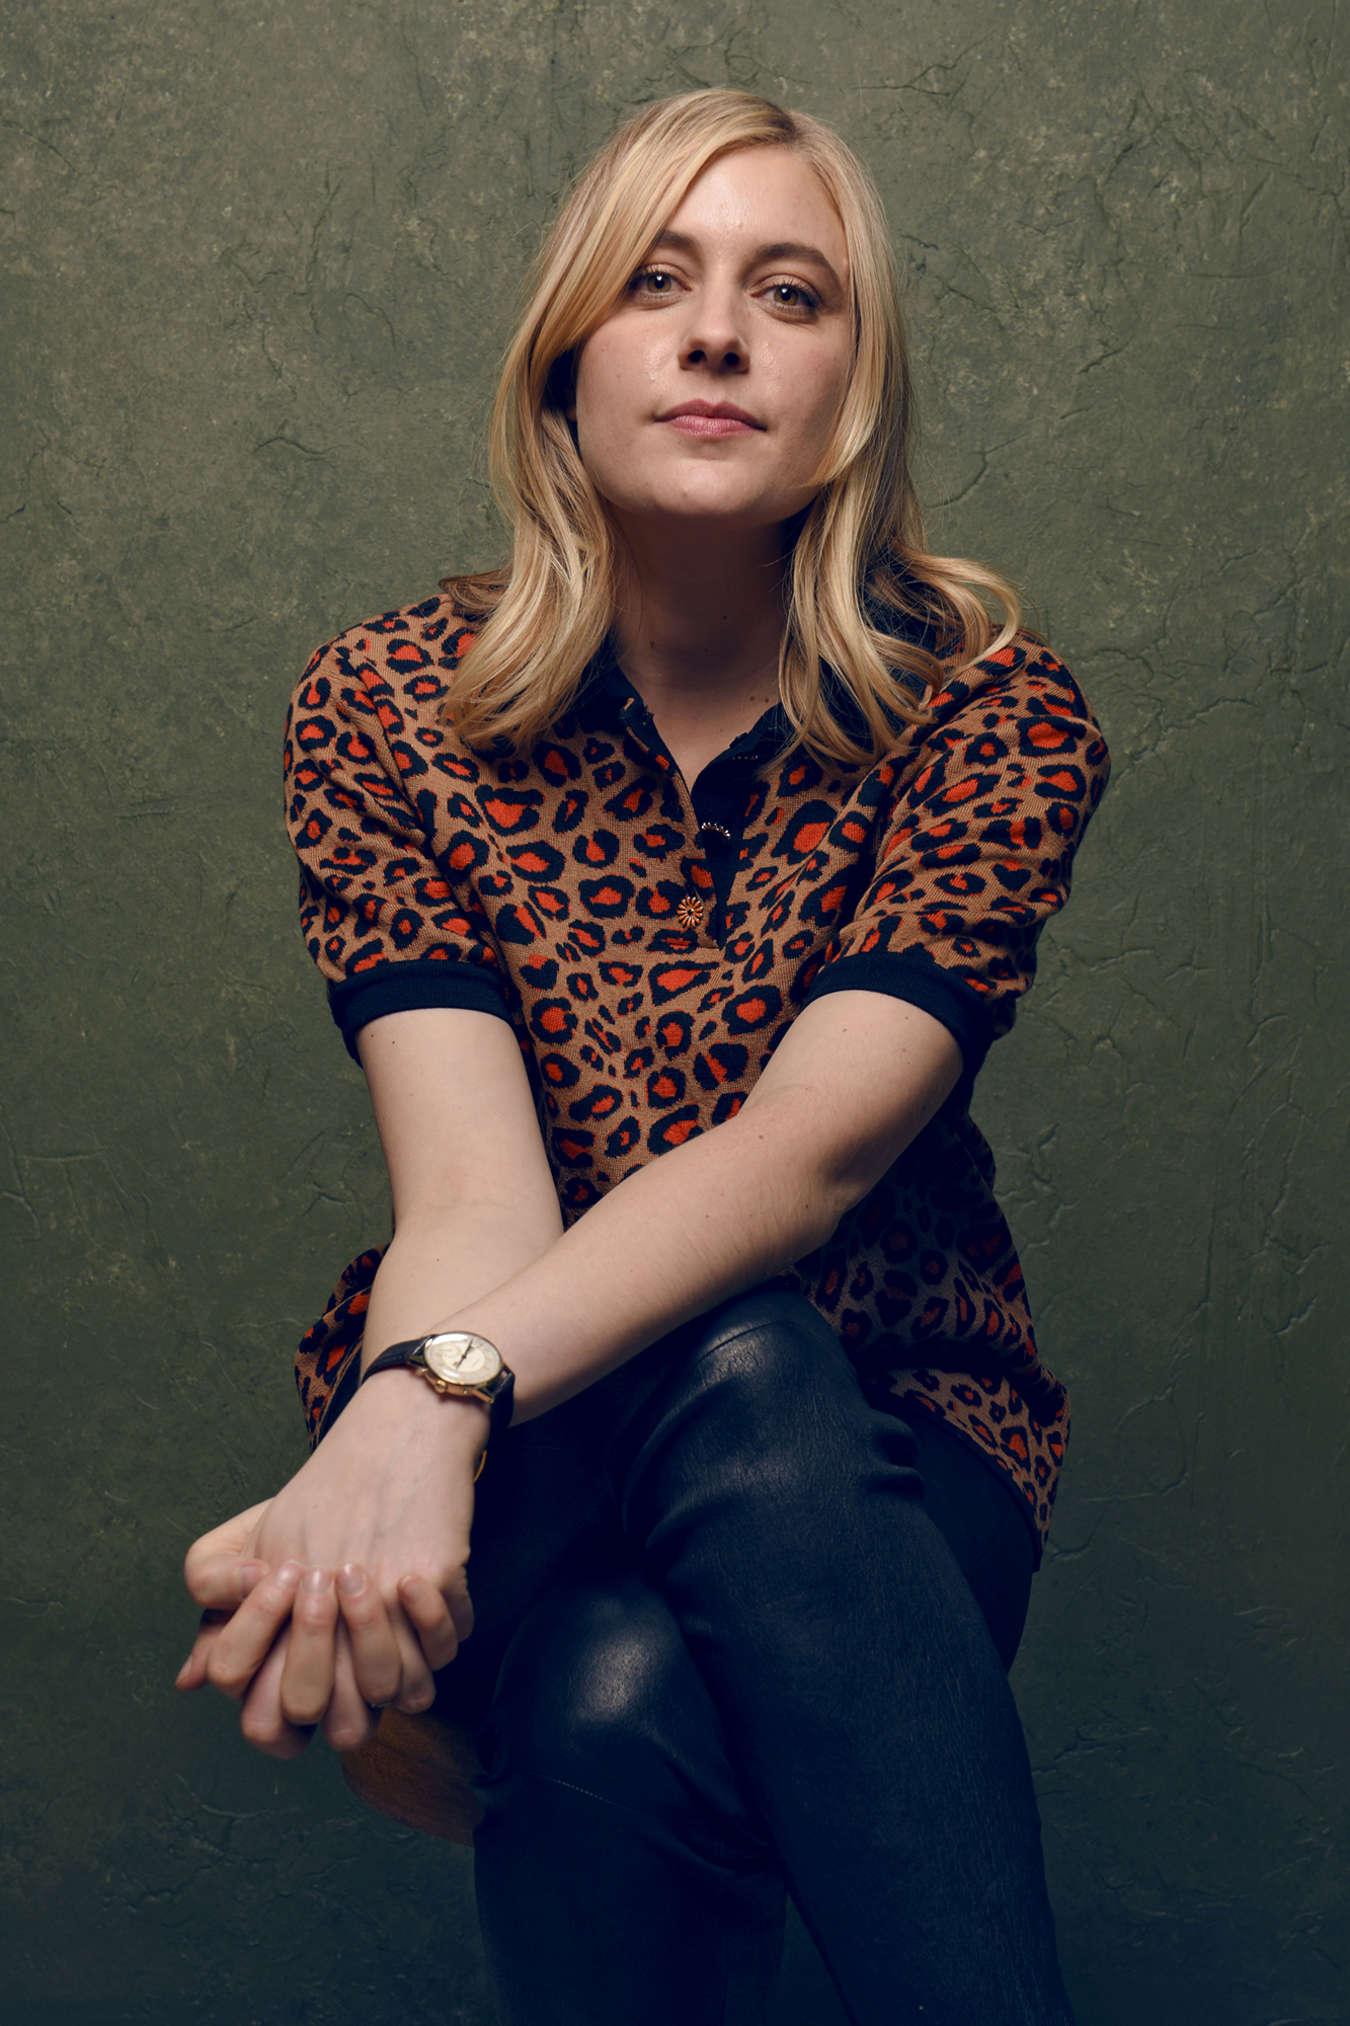 Greta Gerwig Mistress America Portraits Sundance Film Festival in Park City